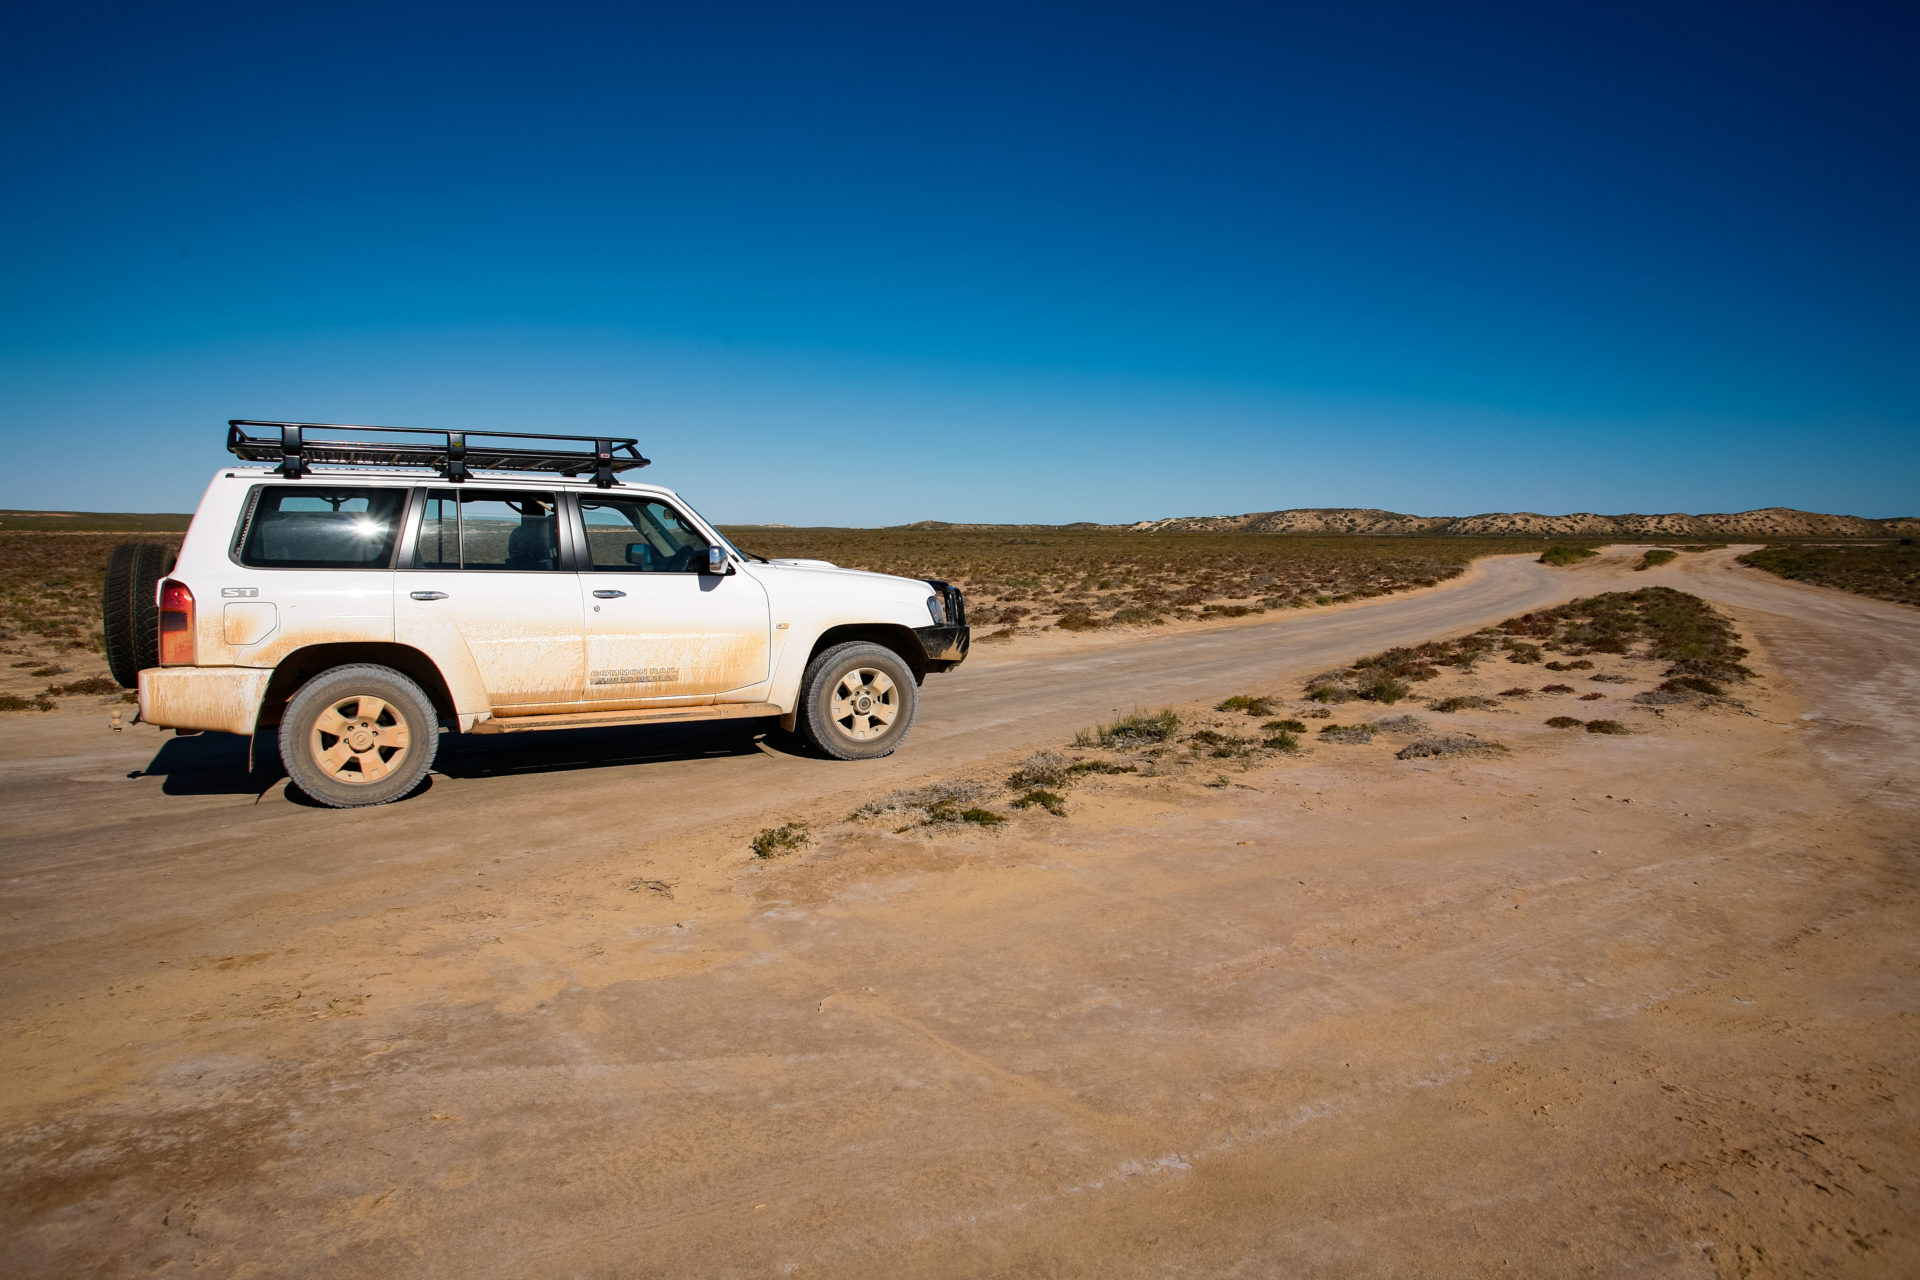 Western Australia 2010 # 01